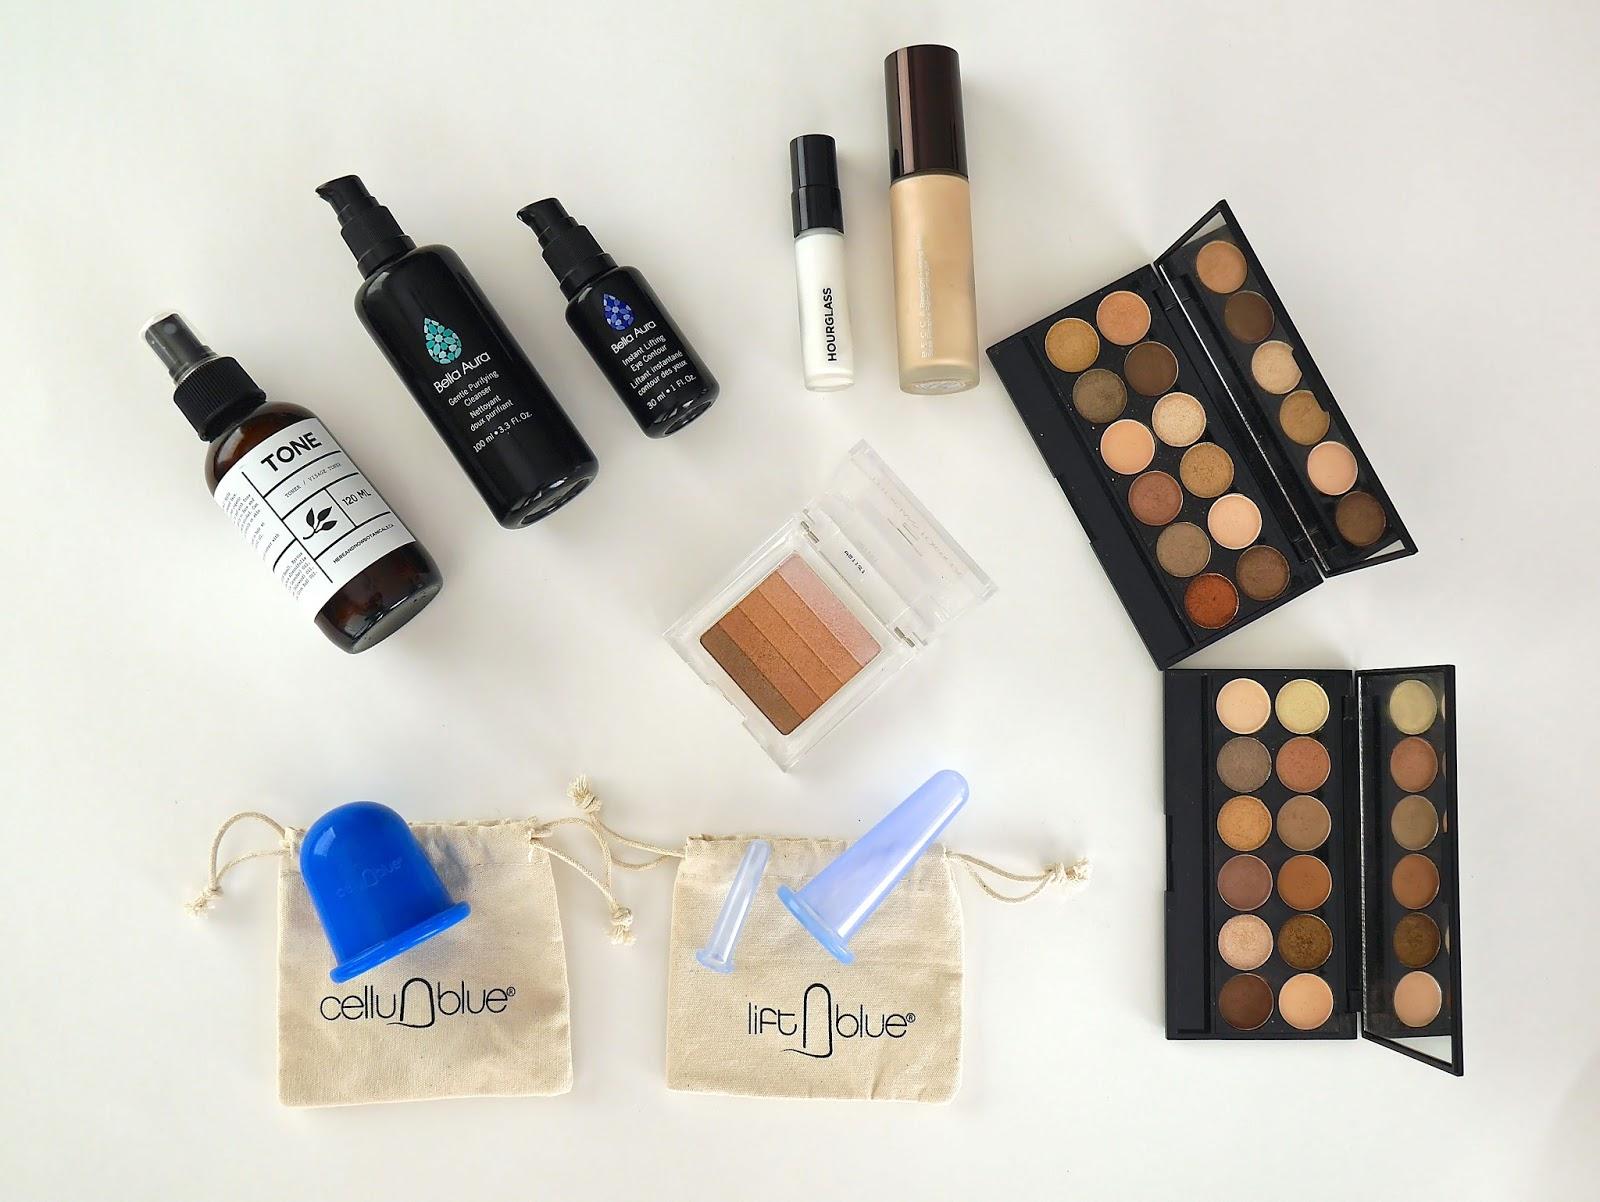 beauty, favourites, skincare, natural skincare, highlighter, primer, moisturizer, eye cream, eyeshadow primer, eyeshadow palette, anti-aging, anti-cellulite